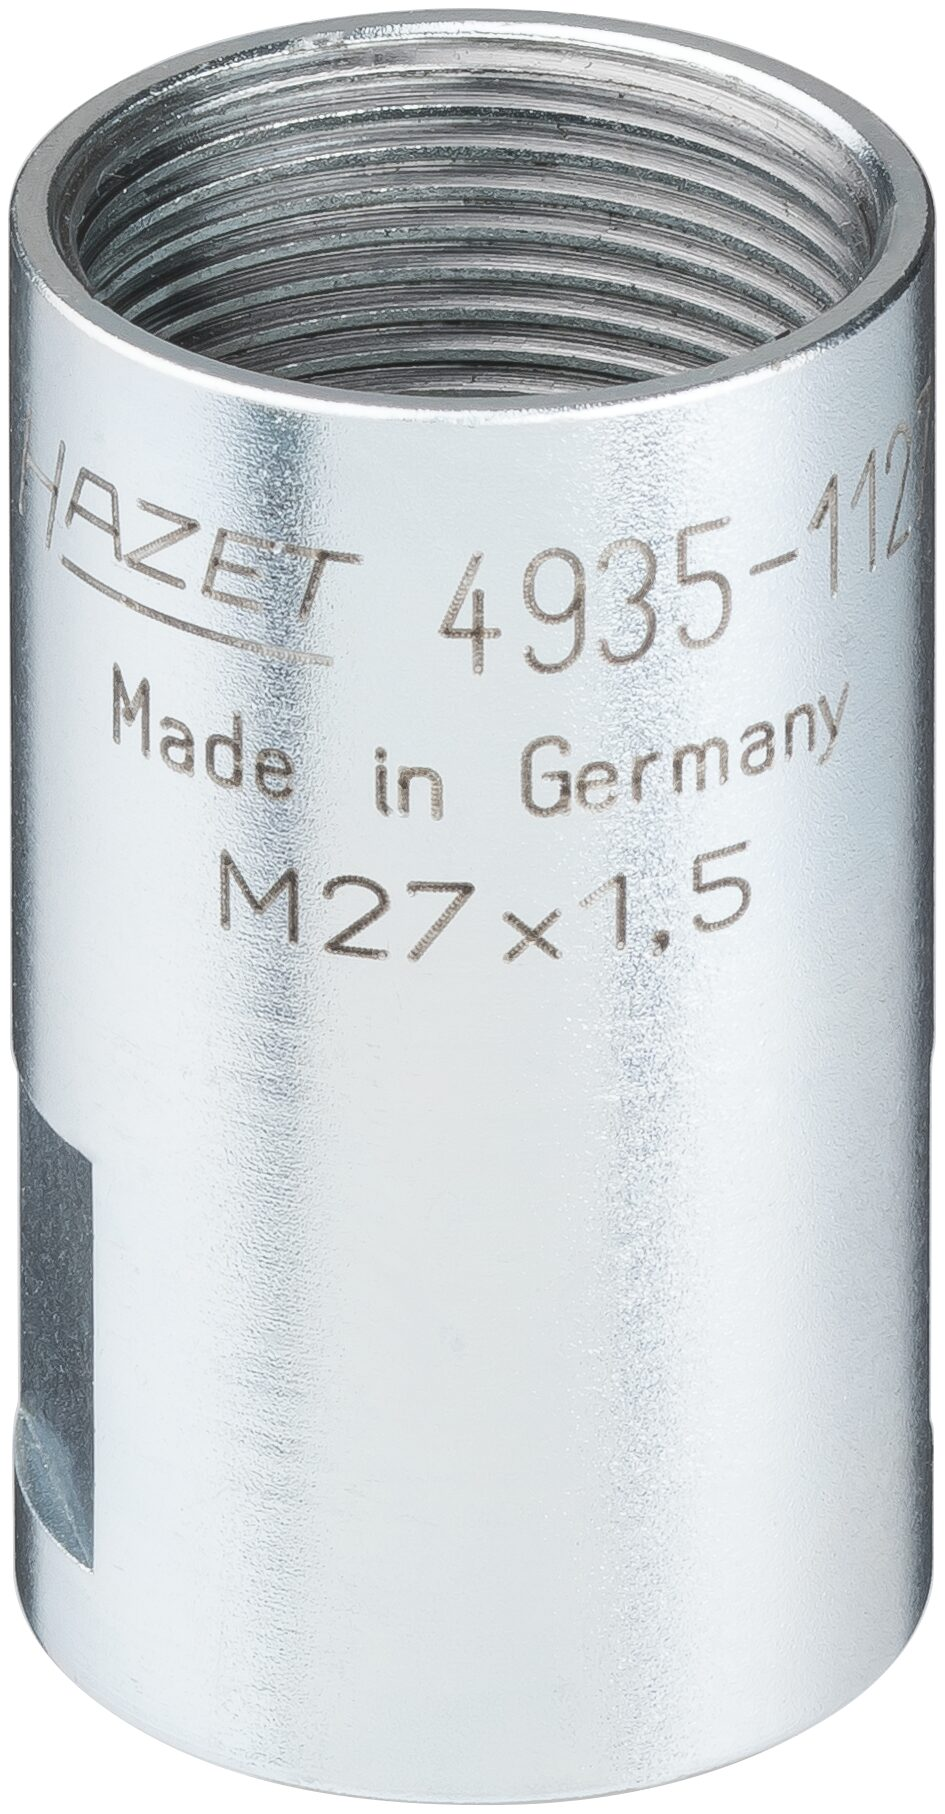 HAZET Ausziehhülse M27x1,5 4935-1127